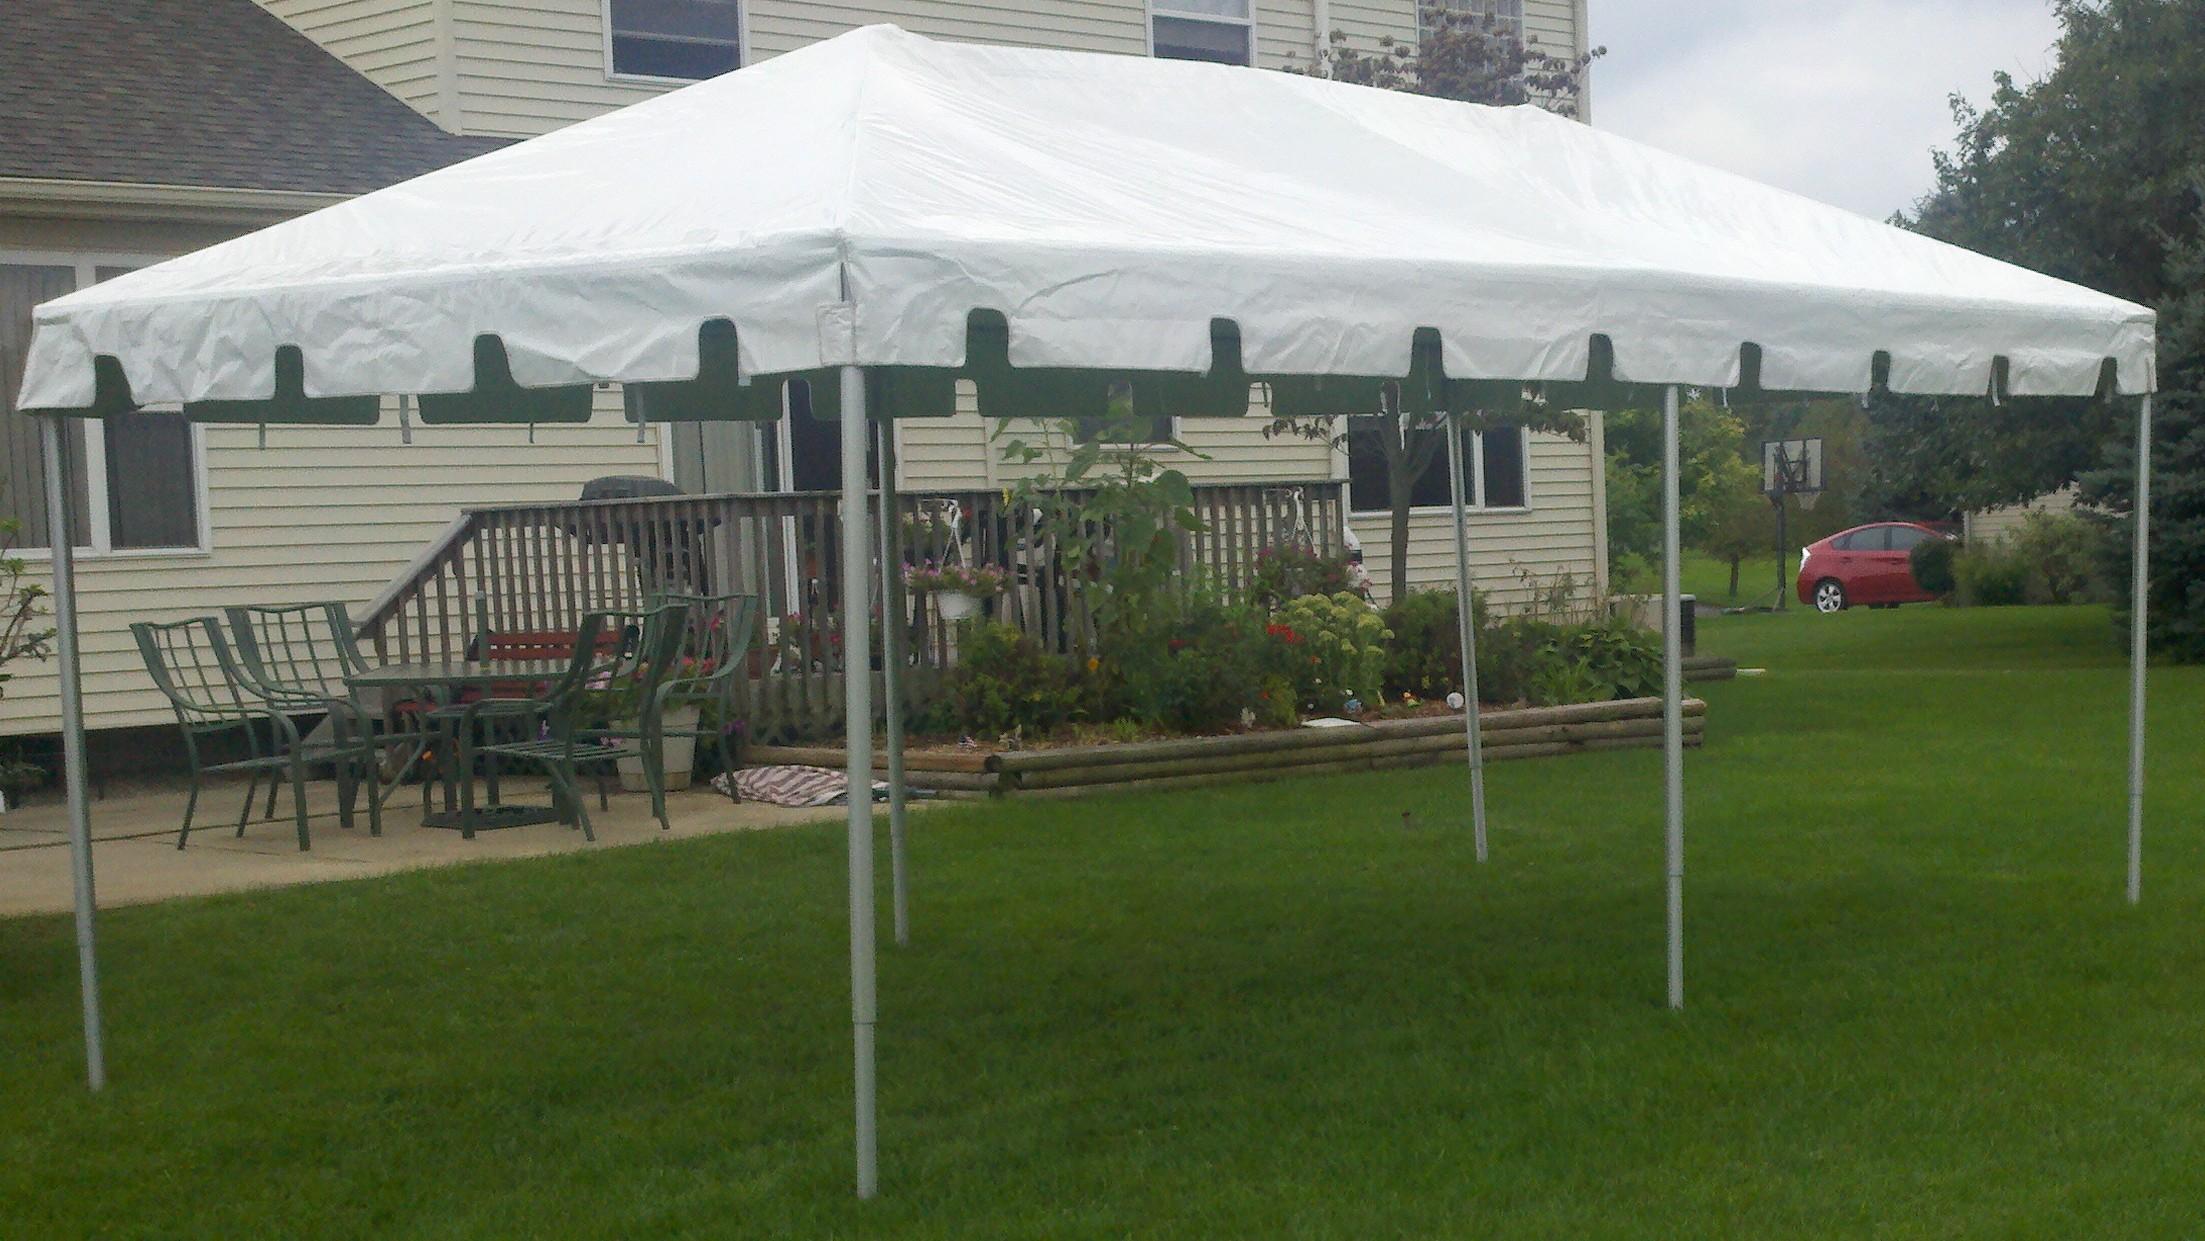 Tents, Pole Tents, Frame Tents, Pop-Up Tents